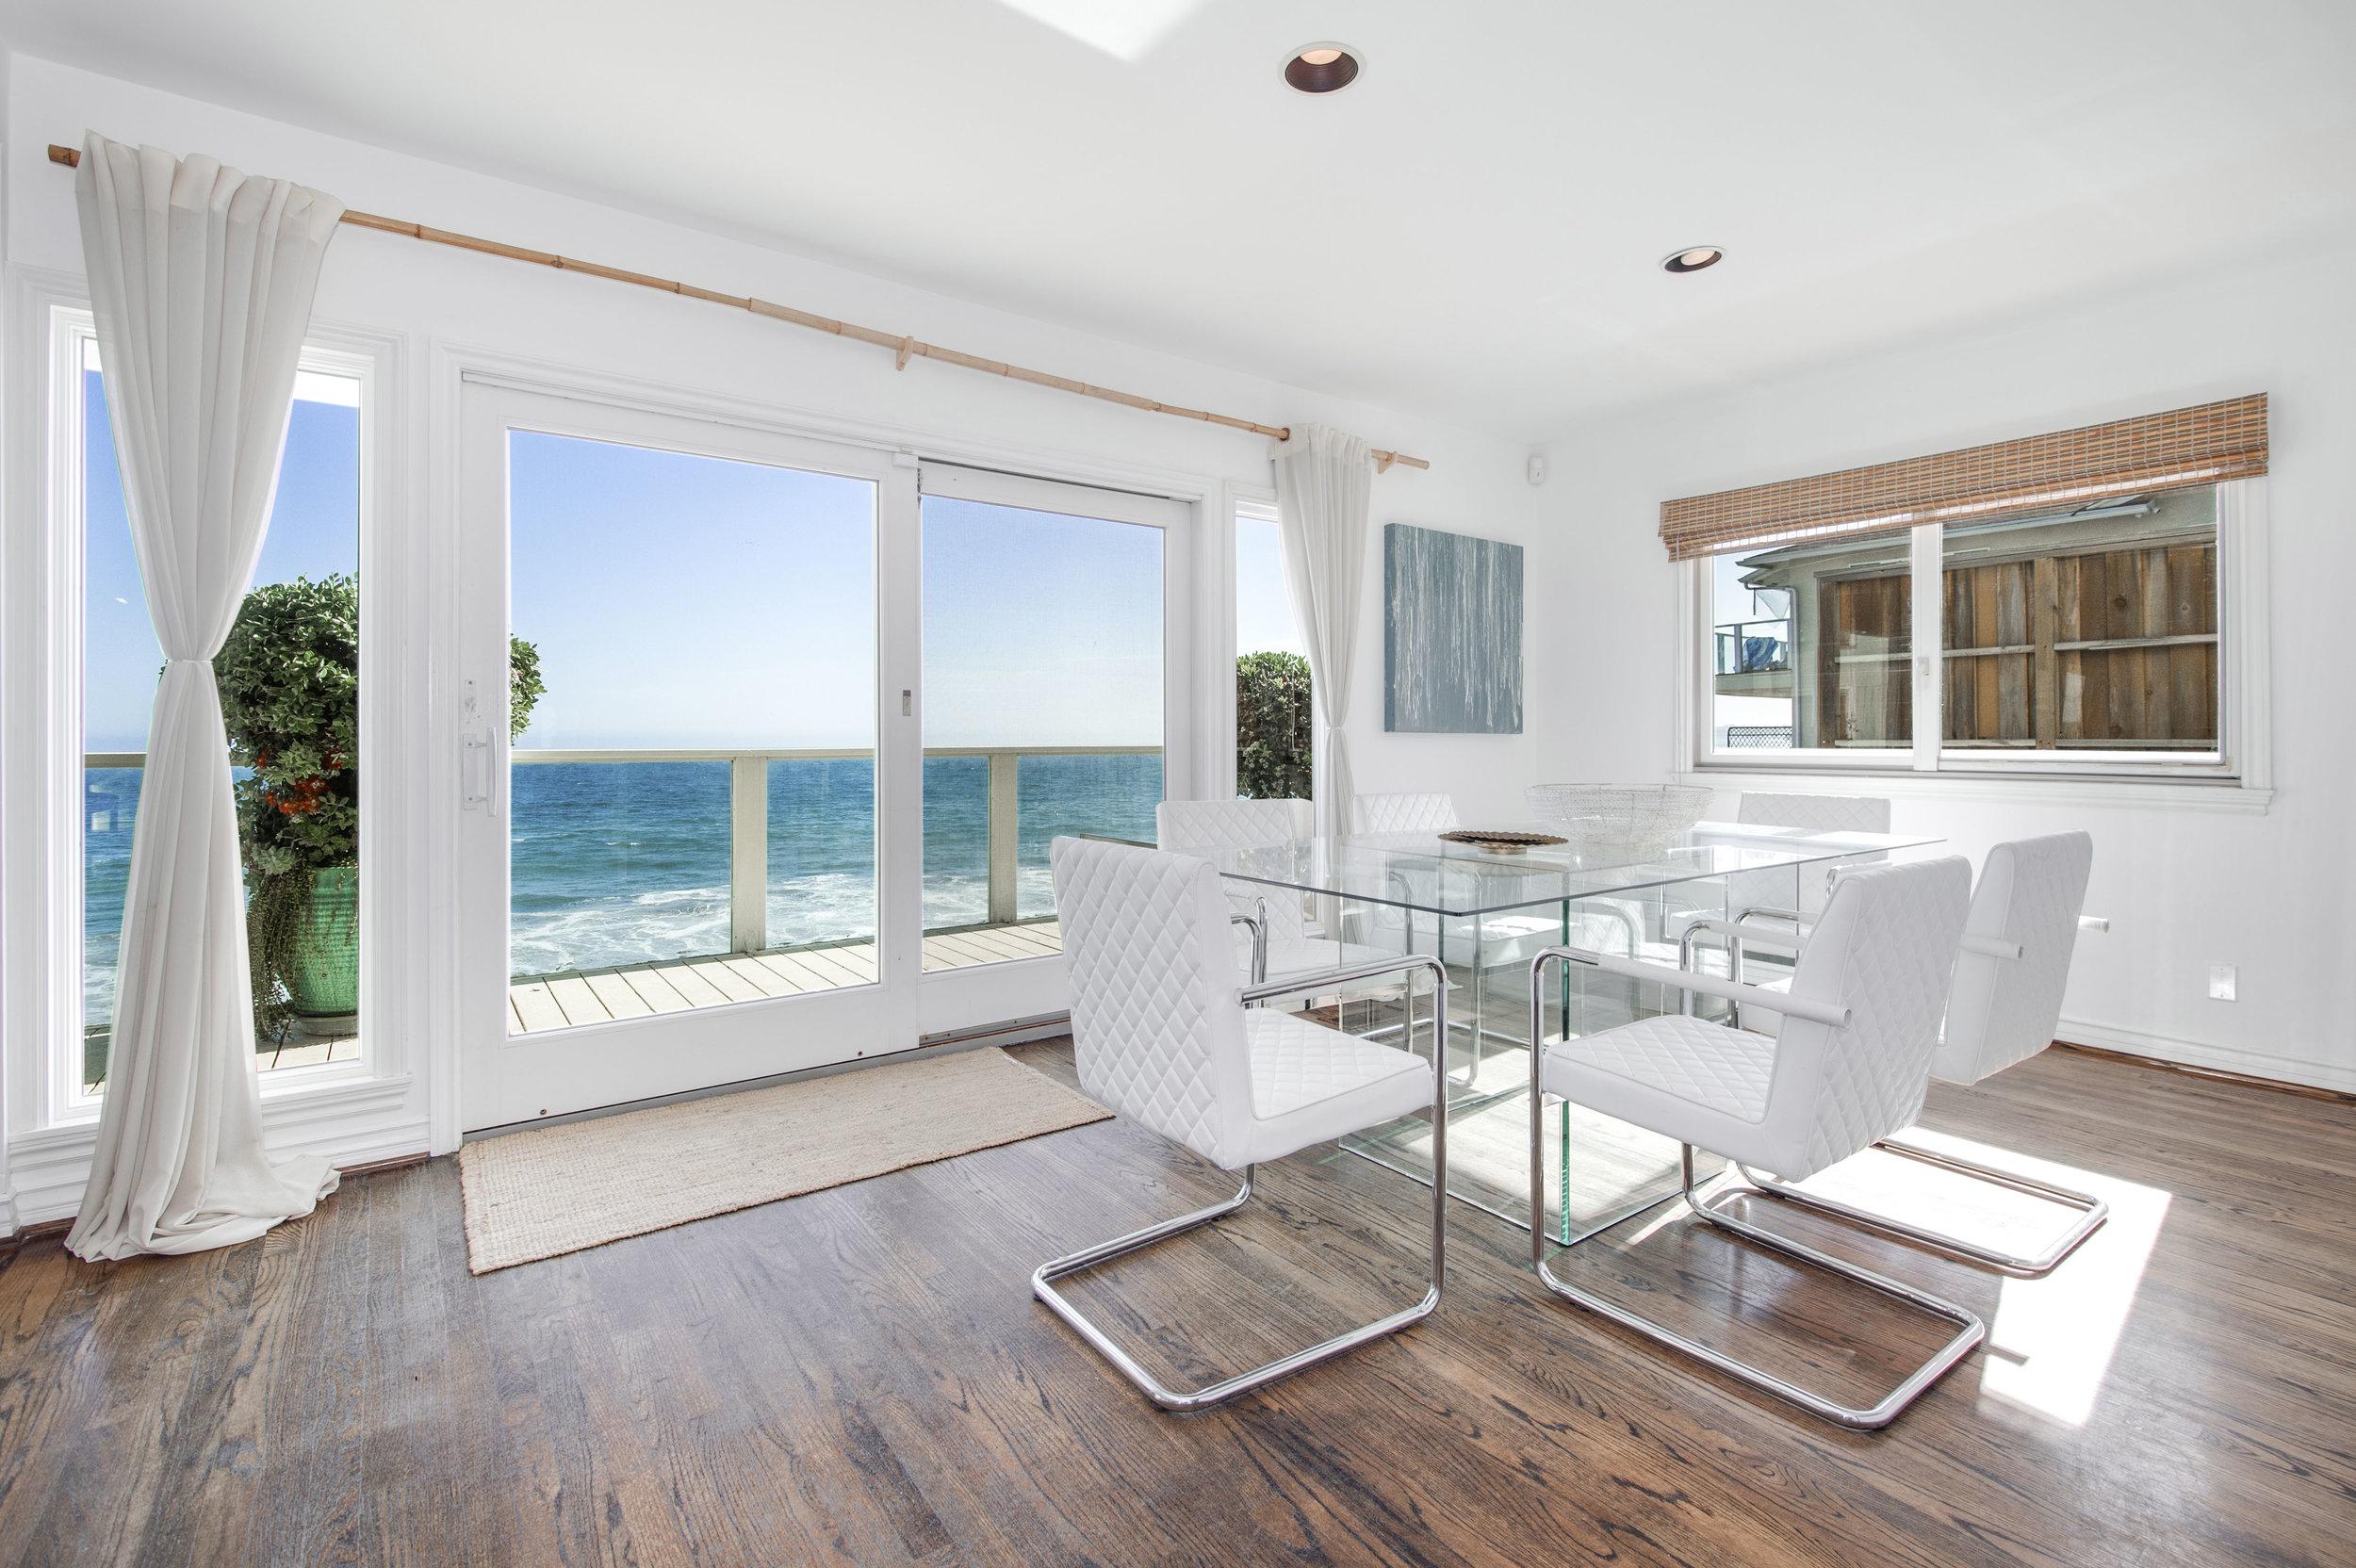 004 Dining 25342 Malibu Road For Sale Lease The Malibu Life Team Luxury Real Estate.jpg